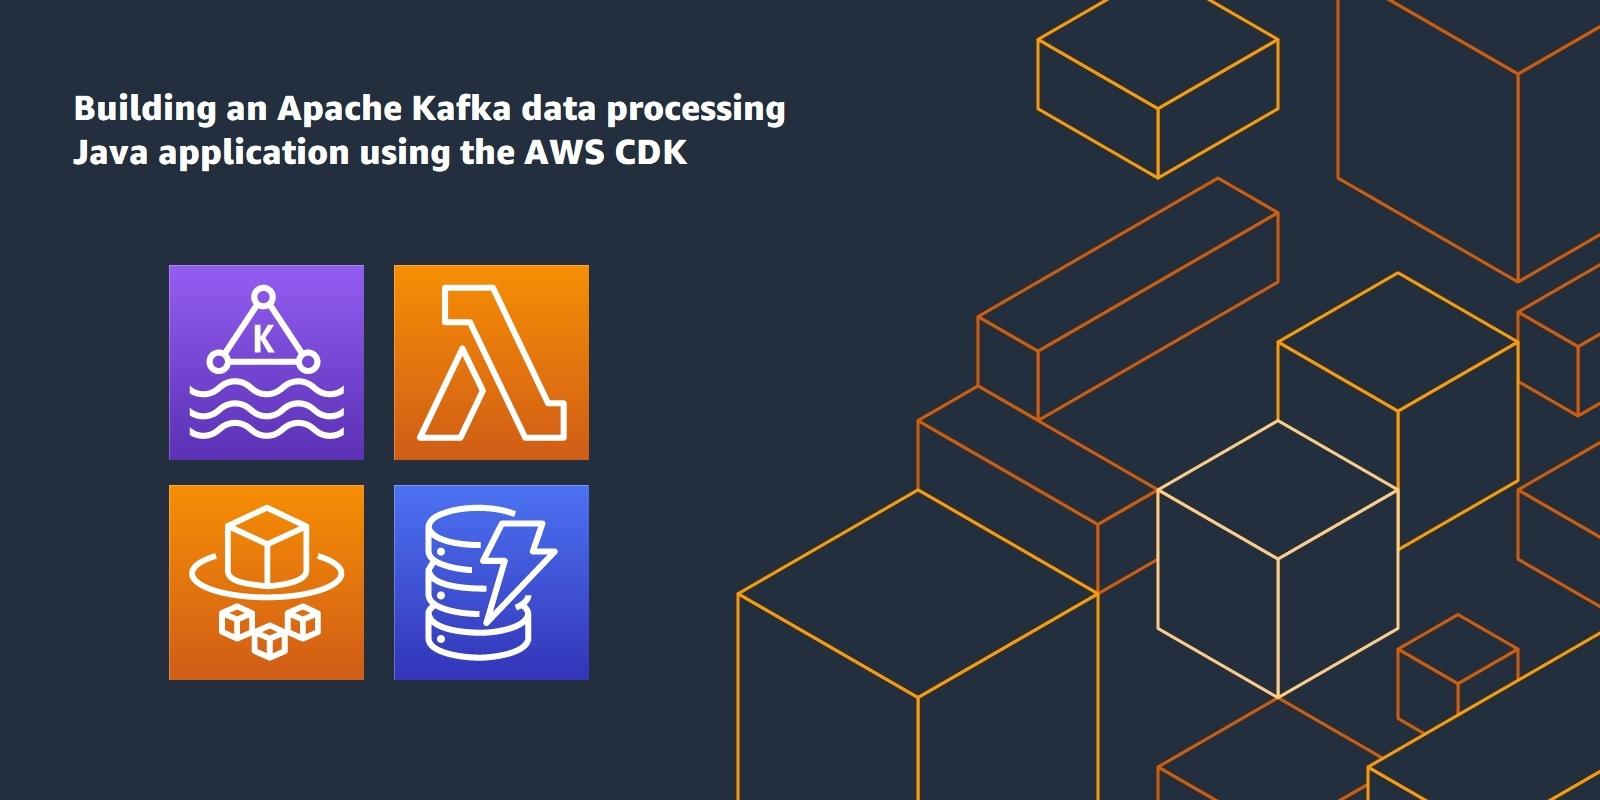 Building an Apache Kafka data processing Java application using the AWS CDK | Amazon Web Services